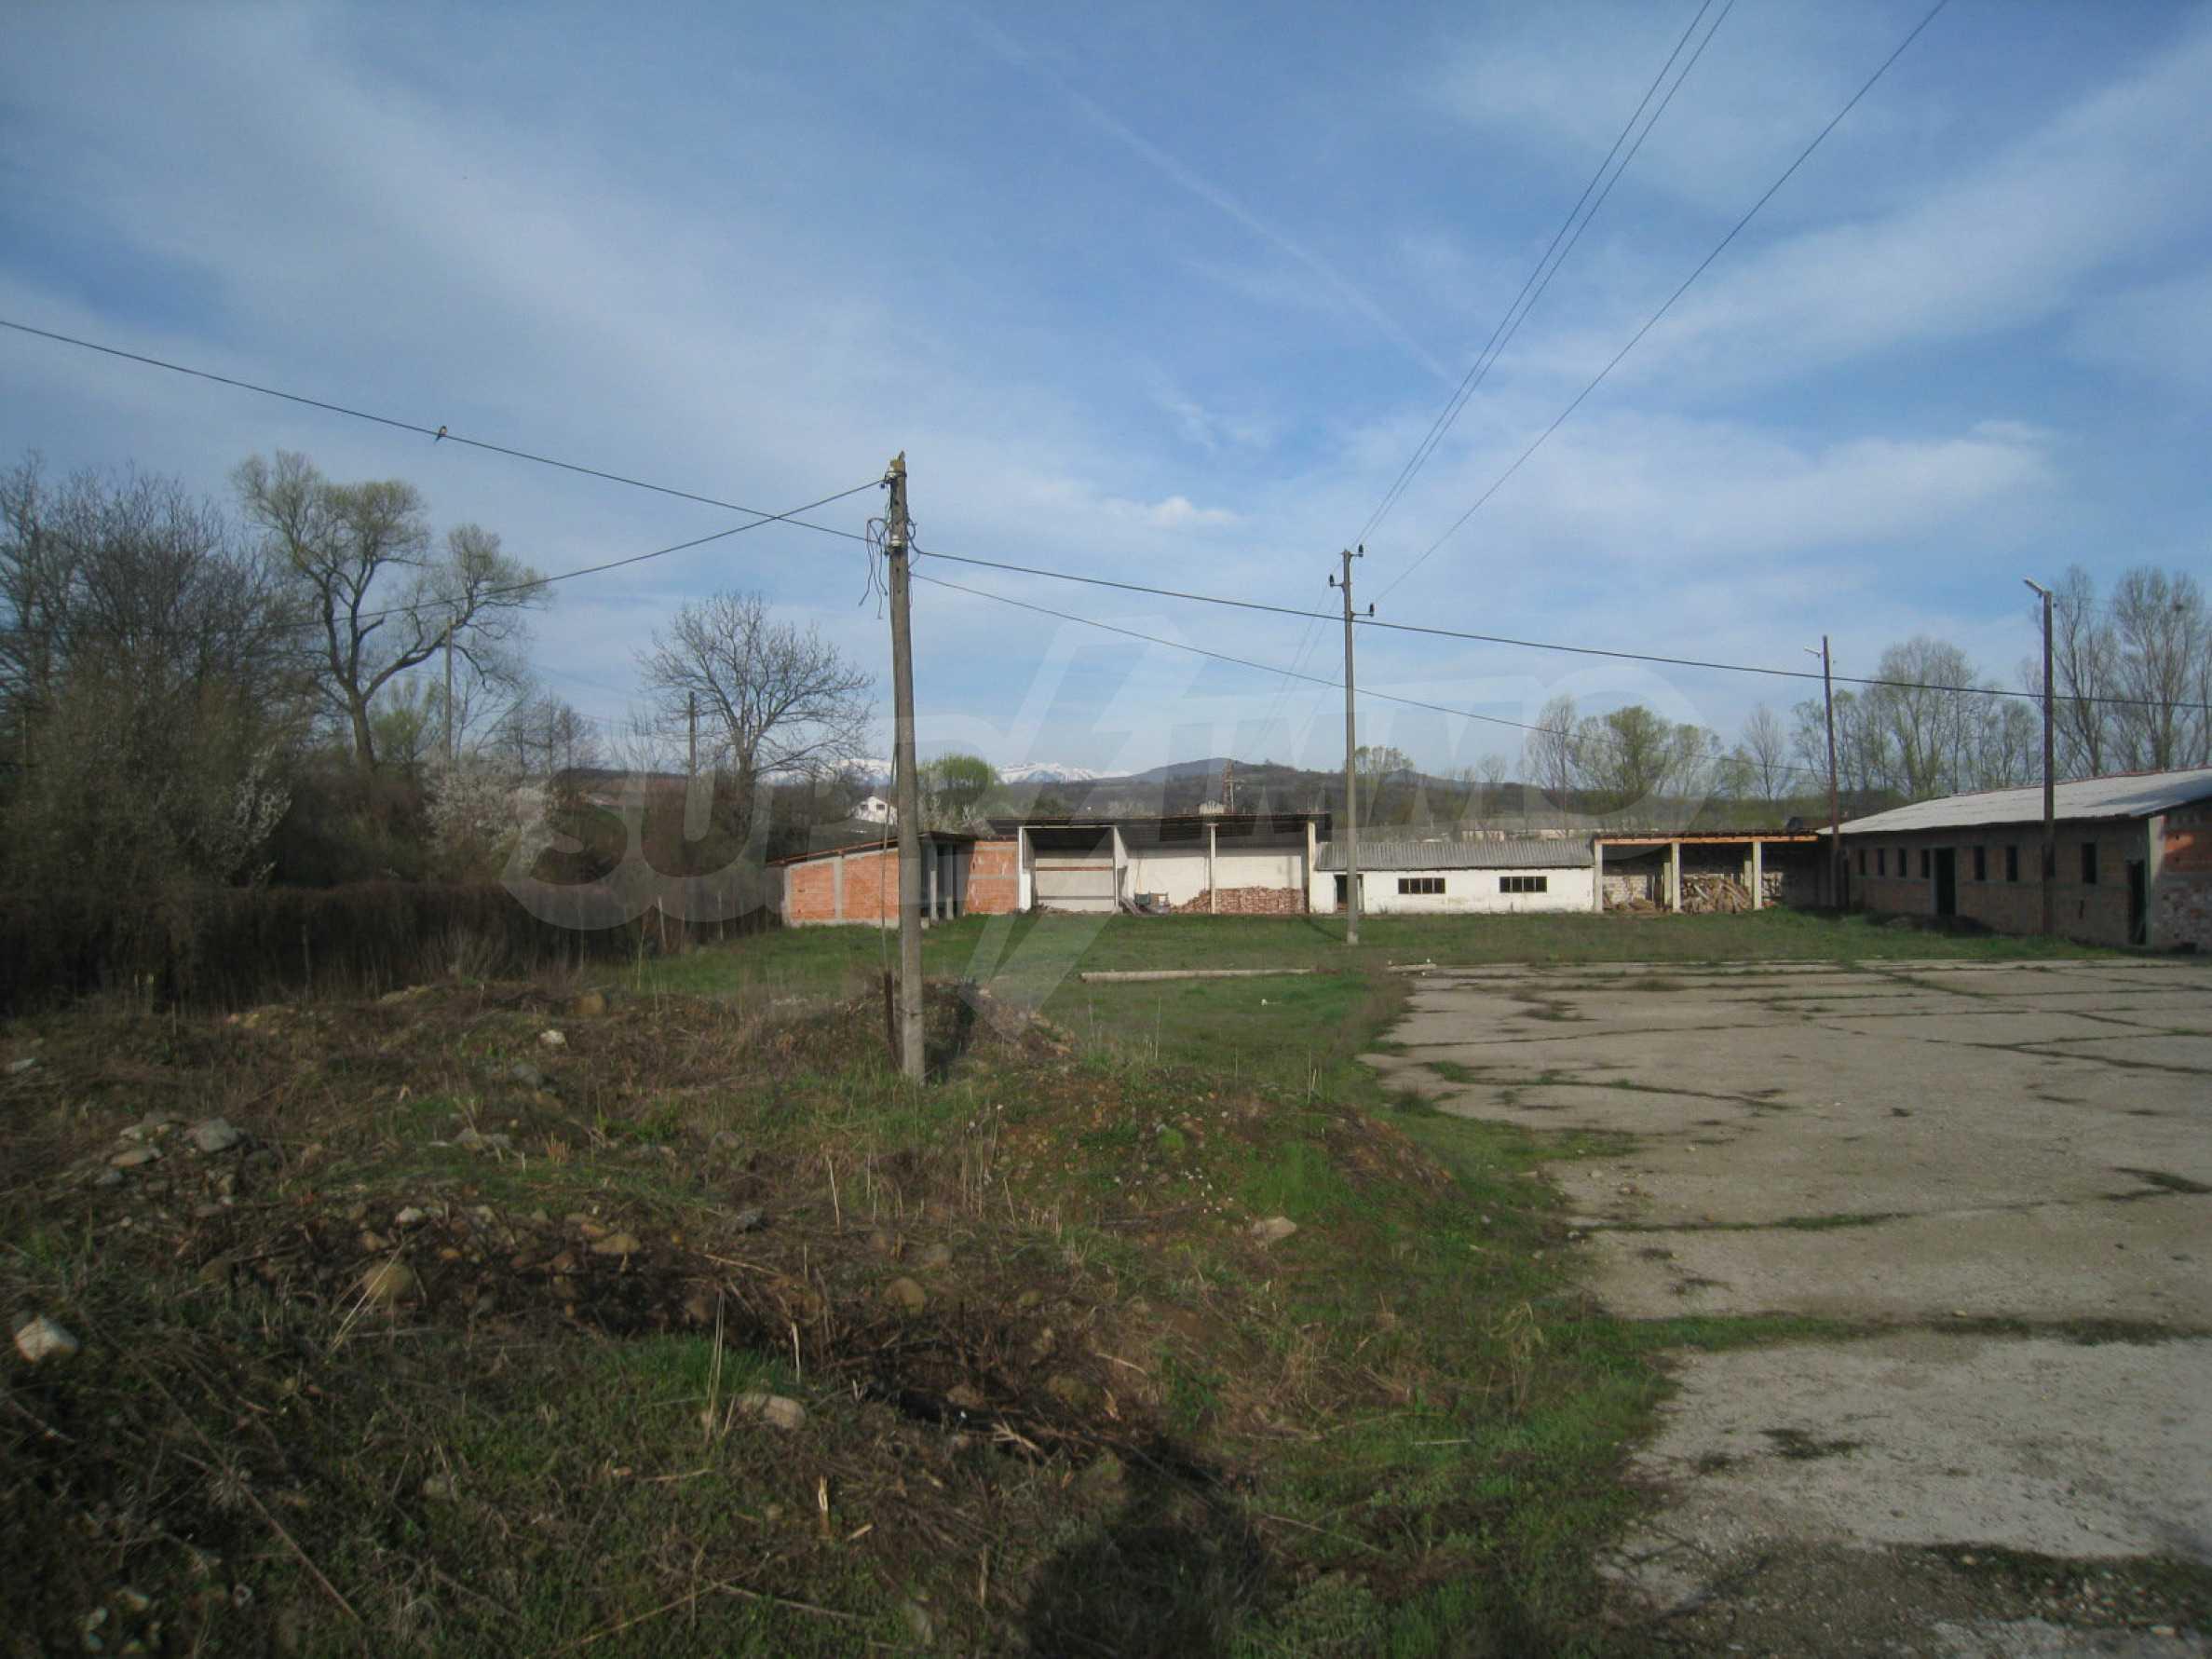 Fishpond, warehouses, residential areas and asphalt ground near Montana 46